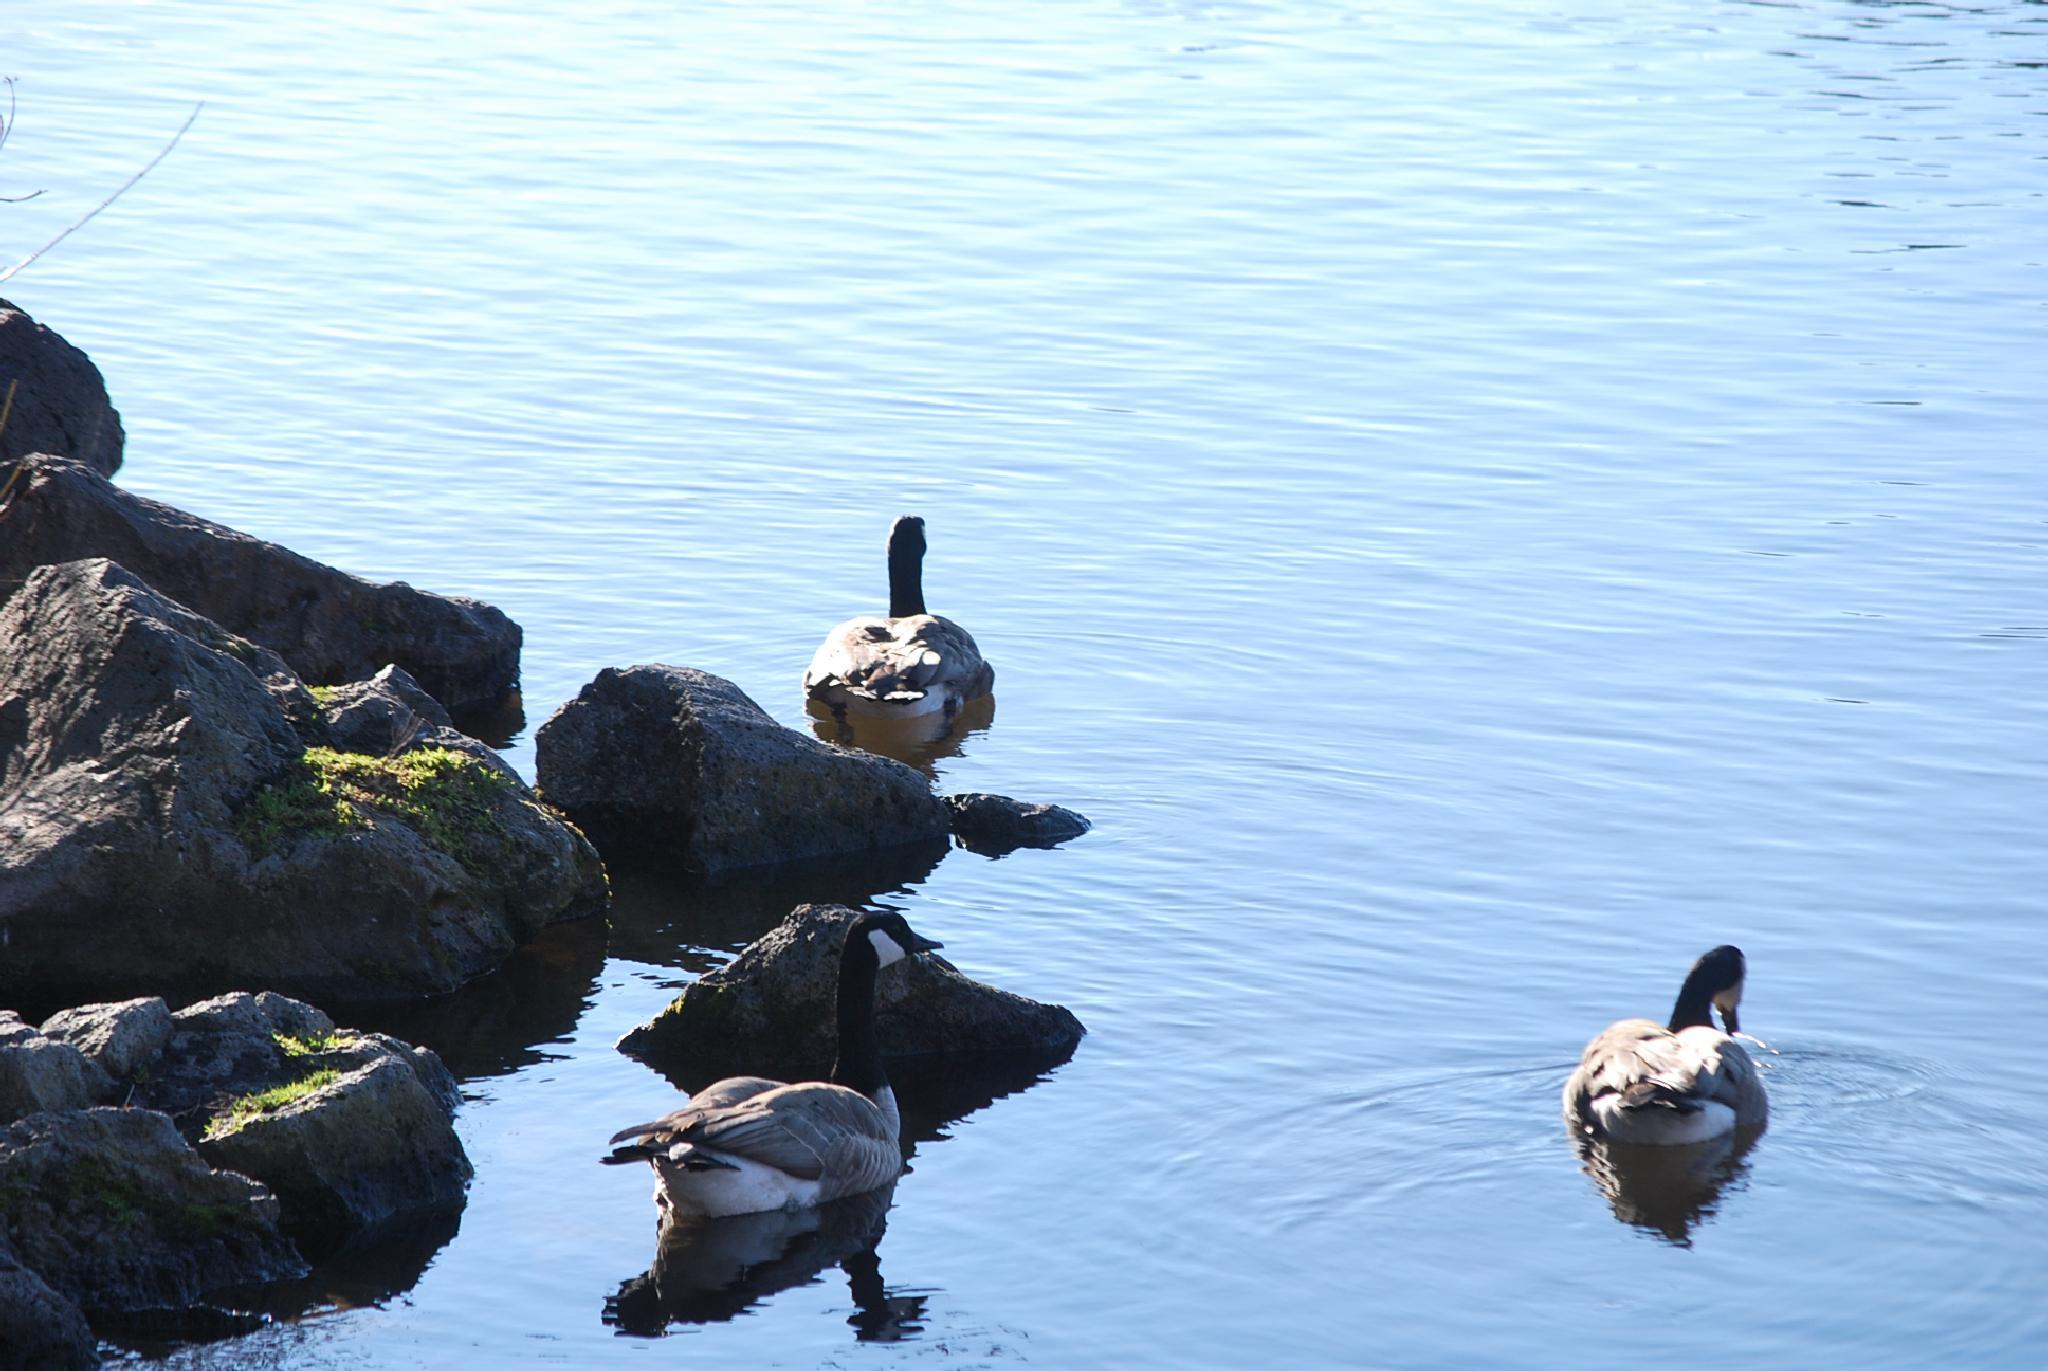 Canadian Geese by marilyn wirtz